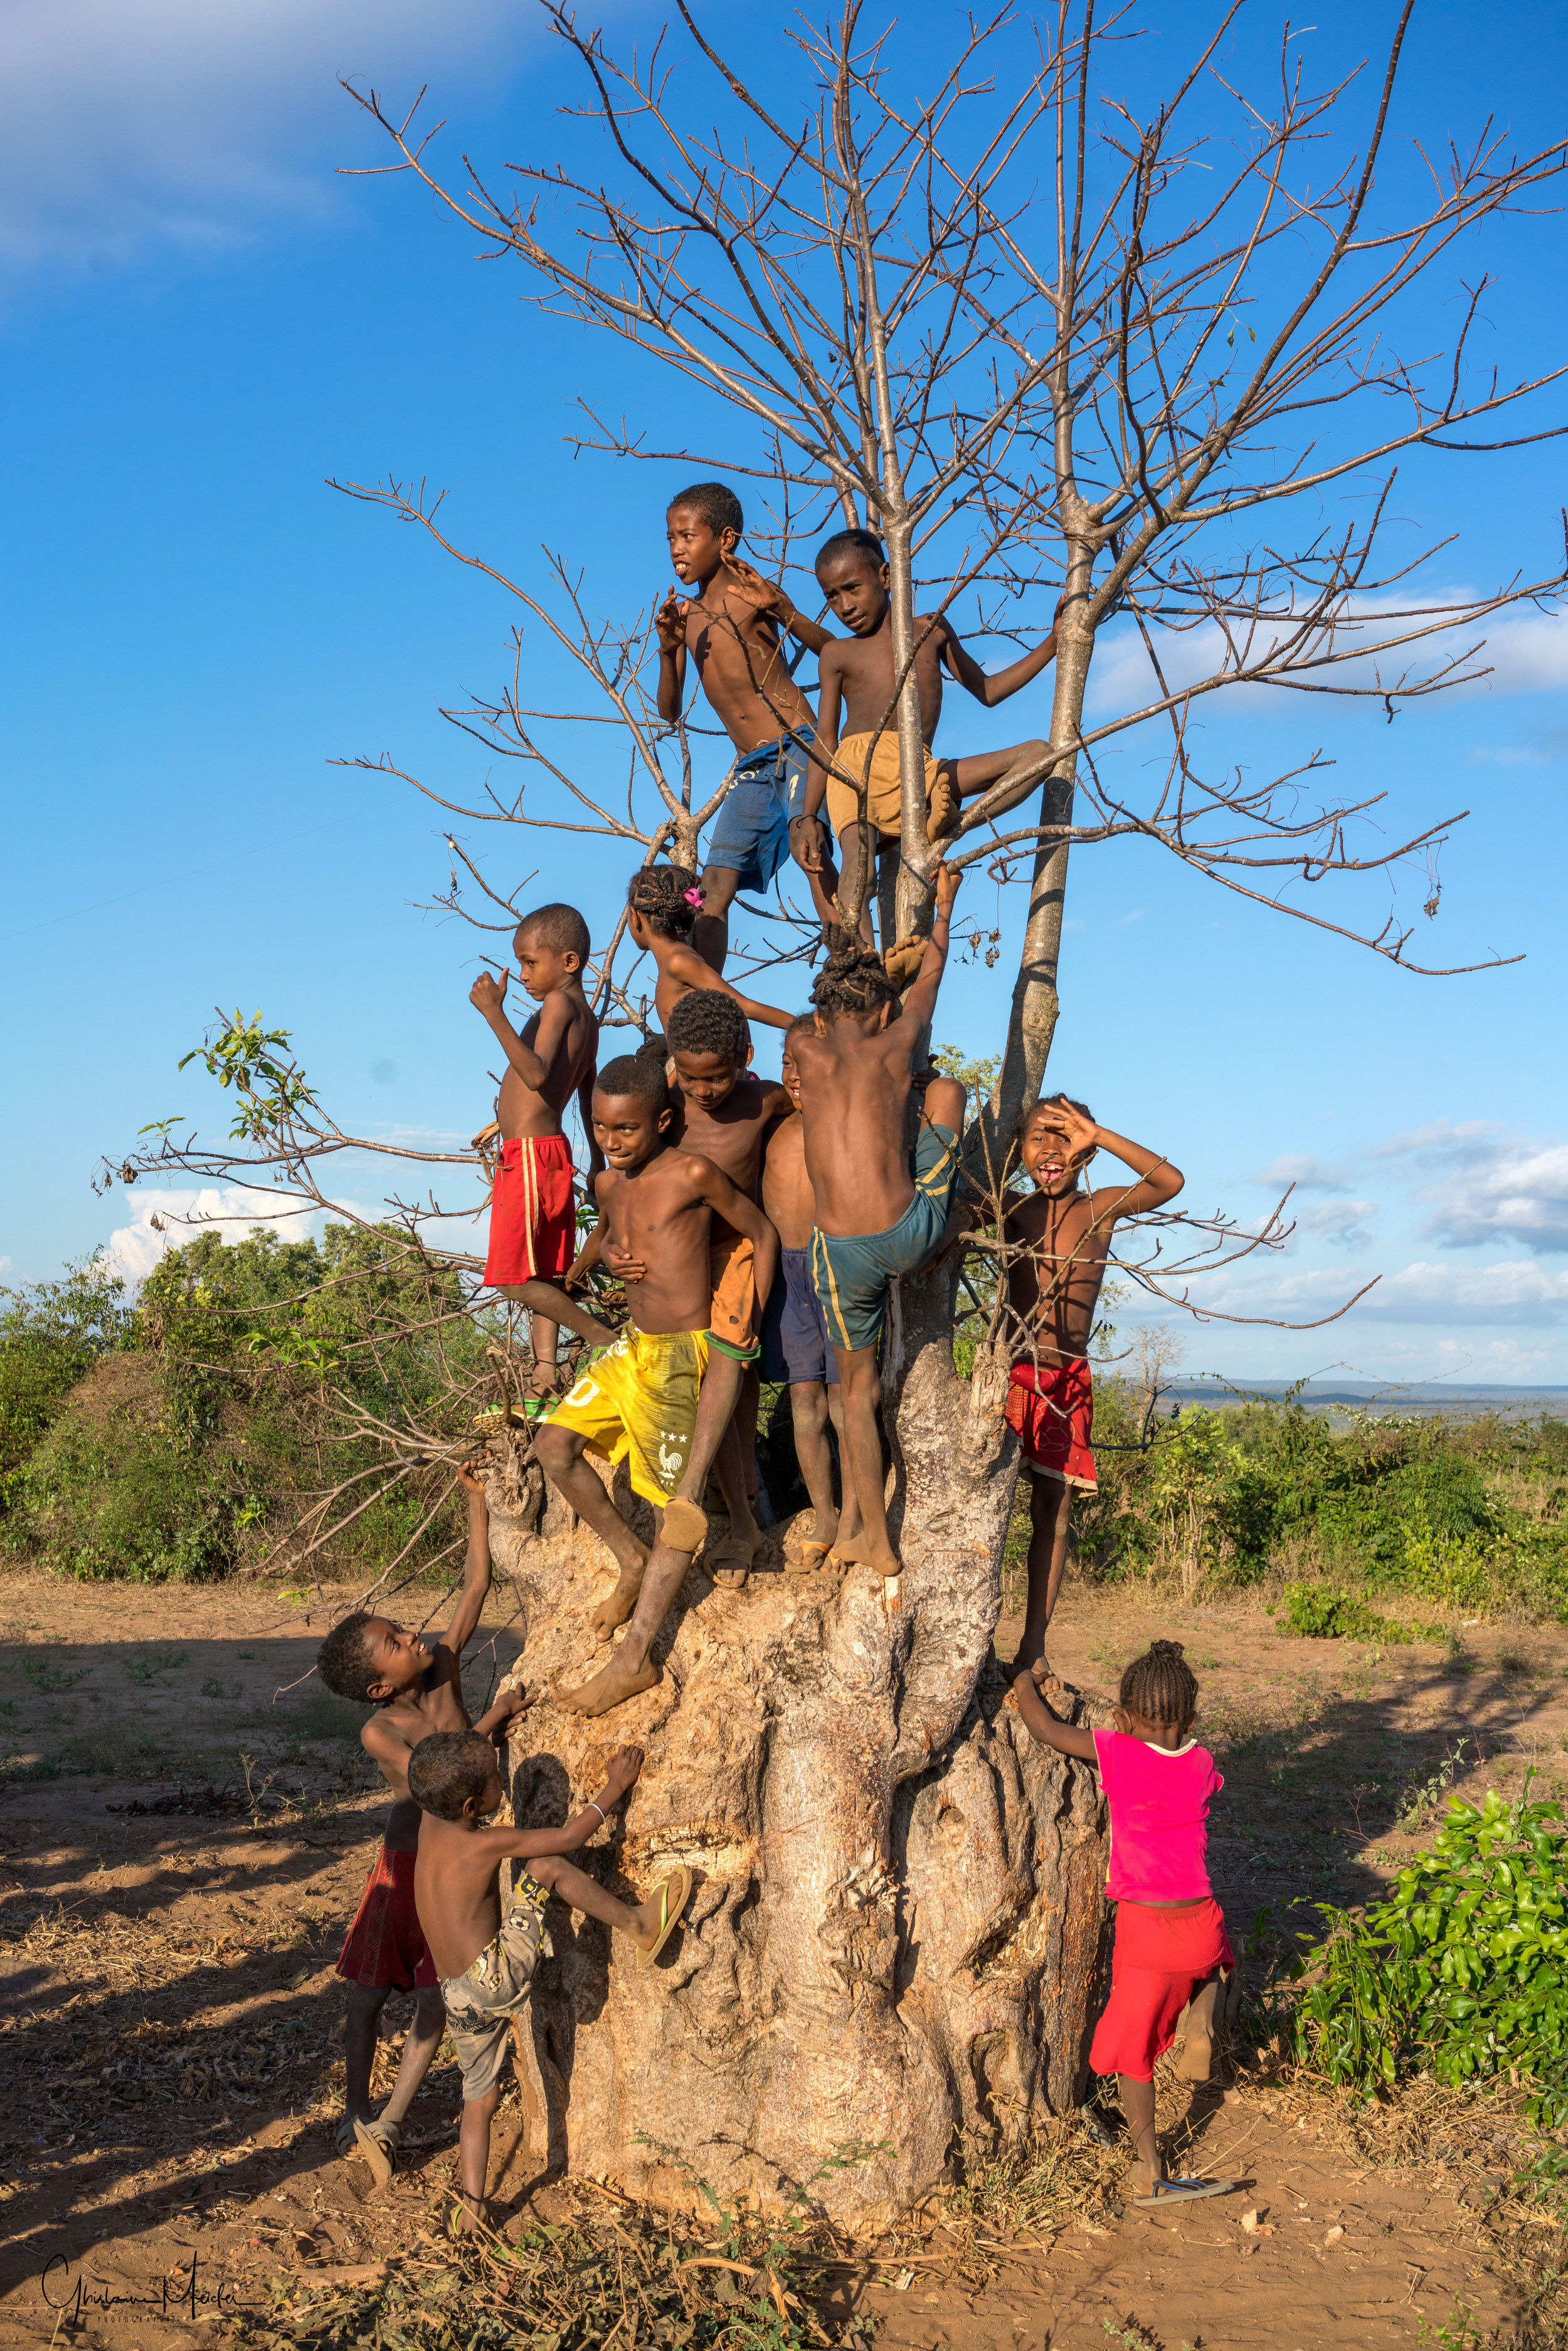 Madagascar-0269-Modifier.jpg